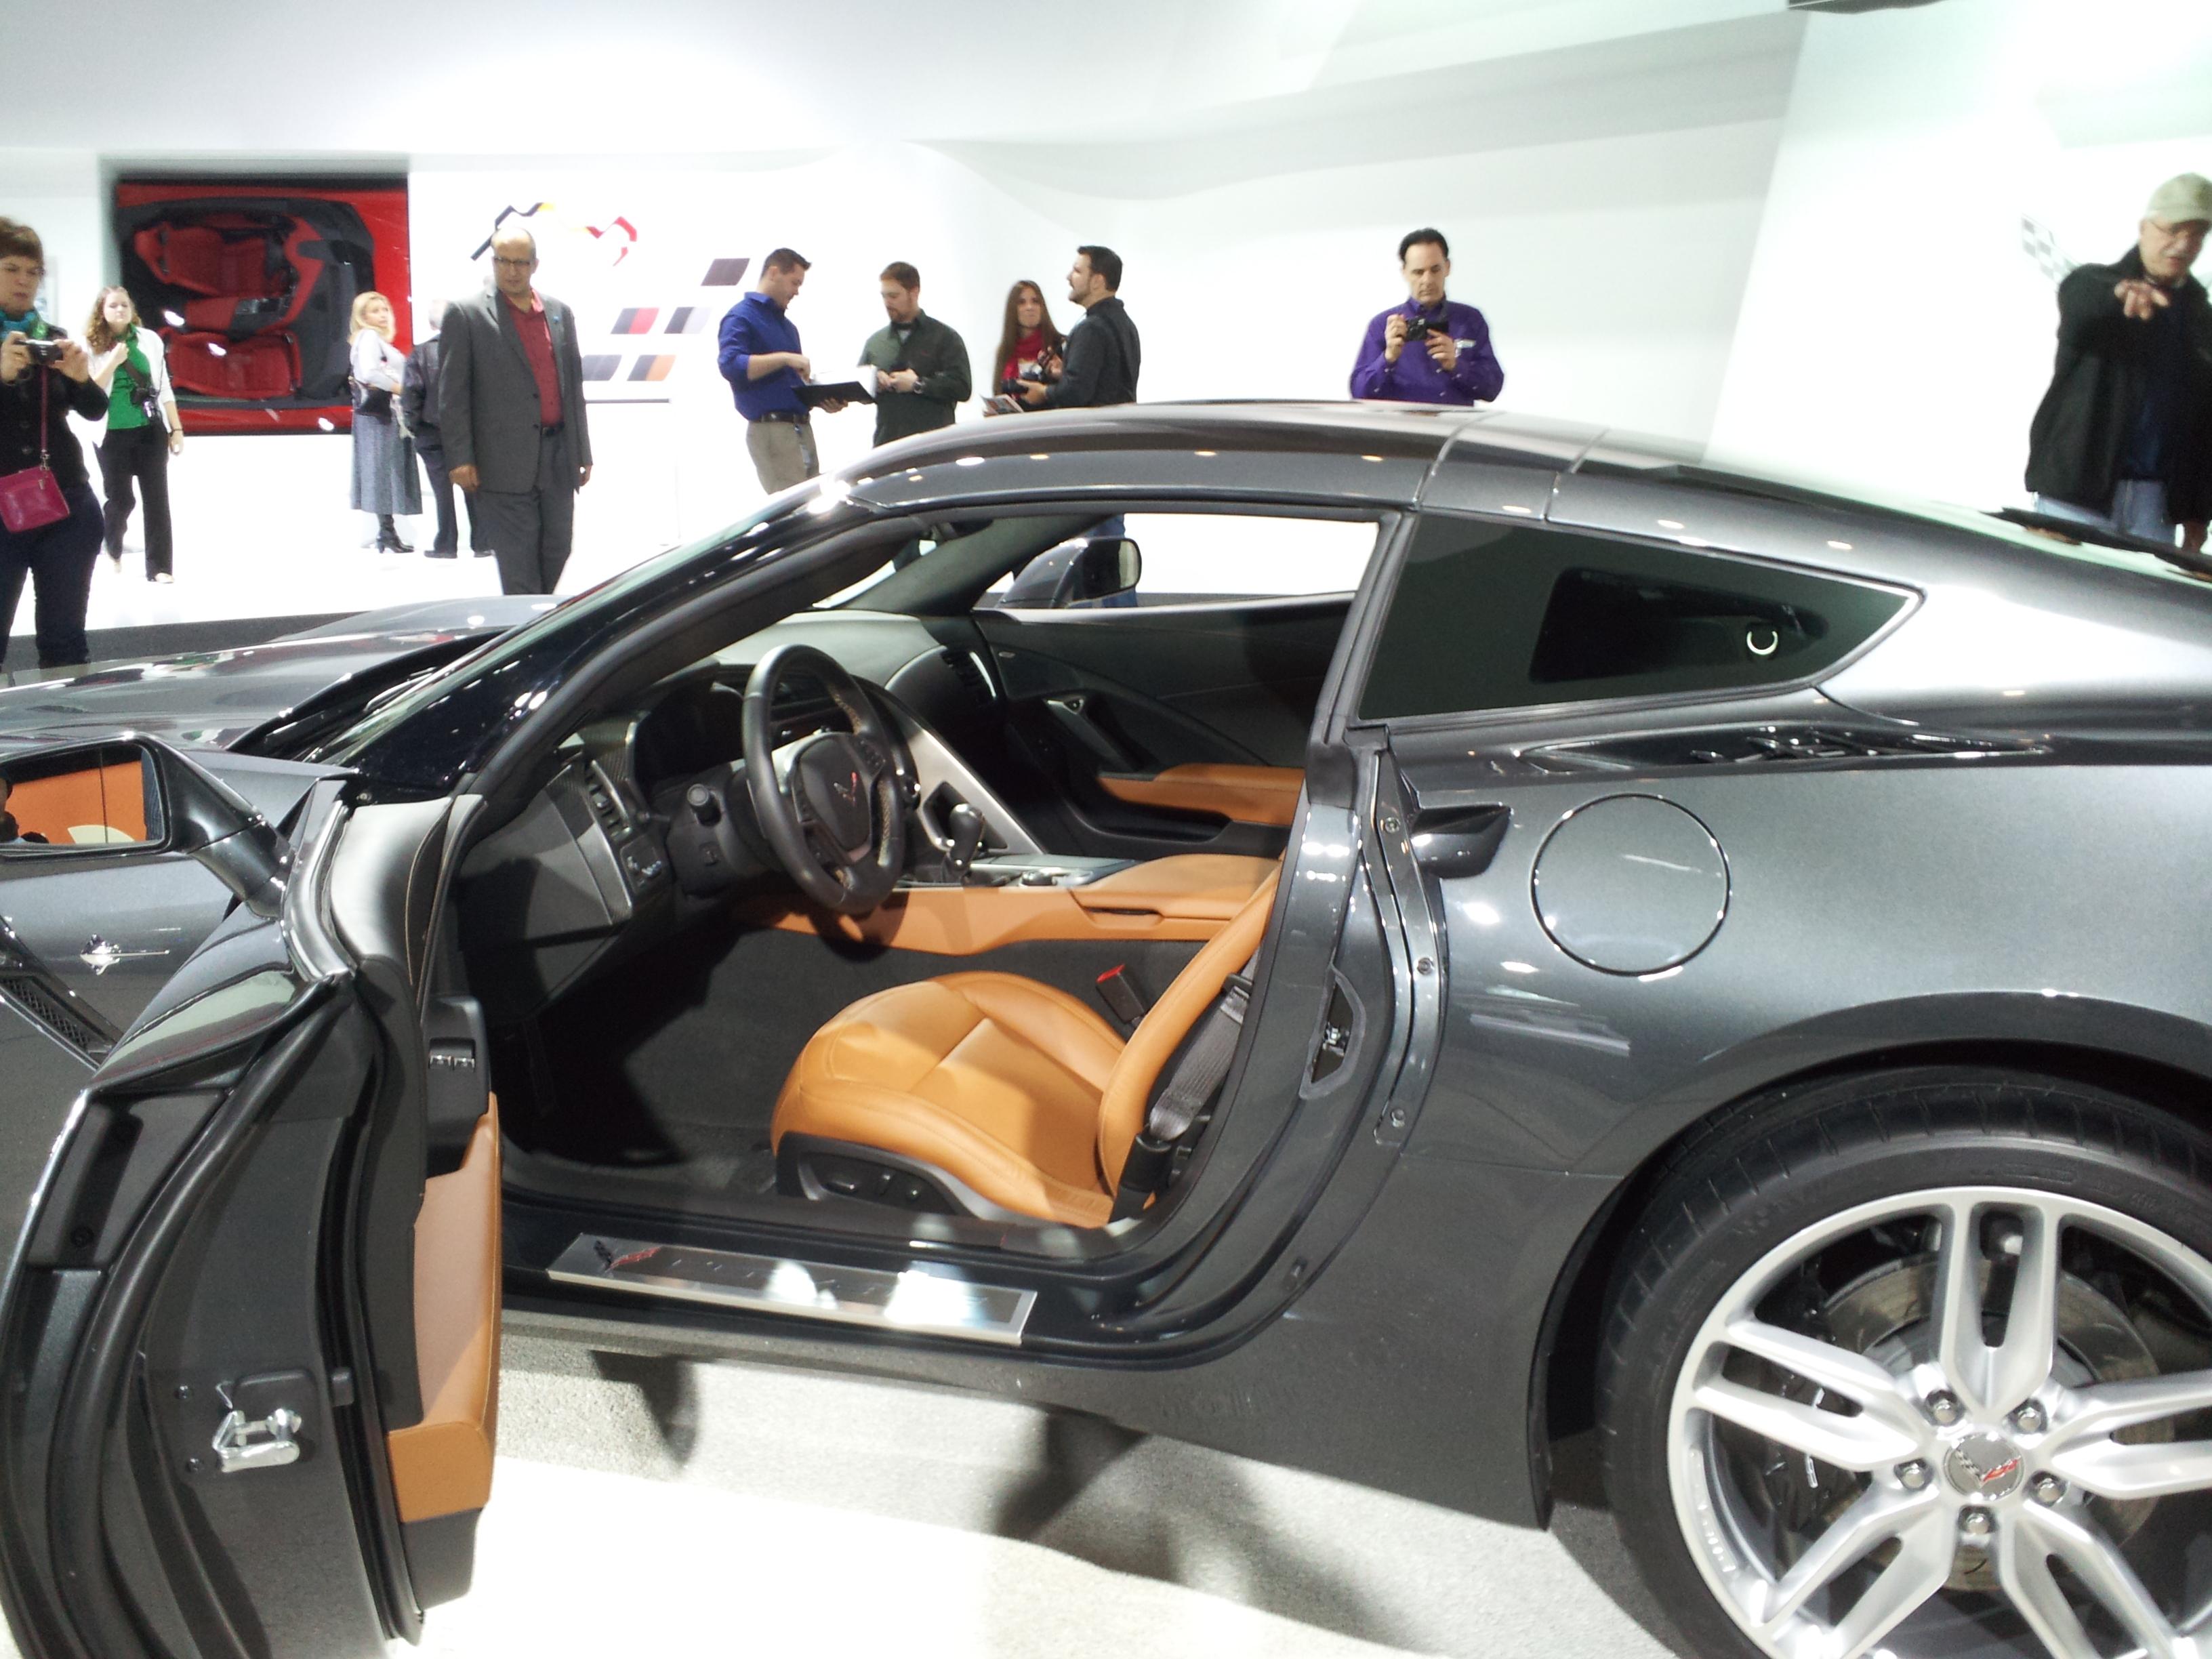 file 2014 corvette kalahari interior at 2013 detroit auto show jpg